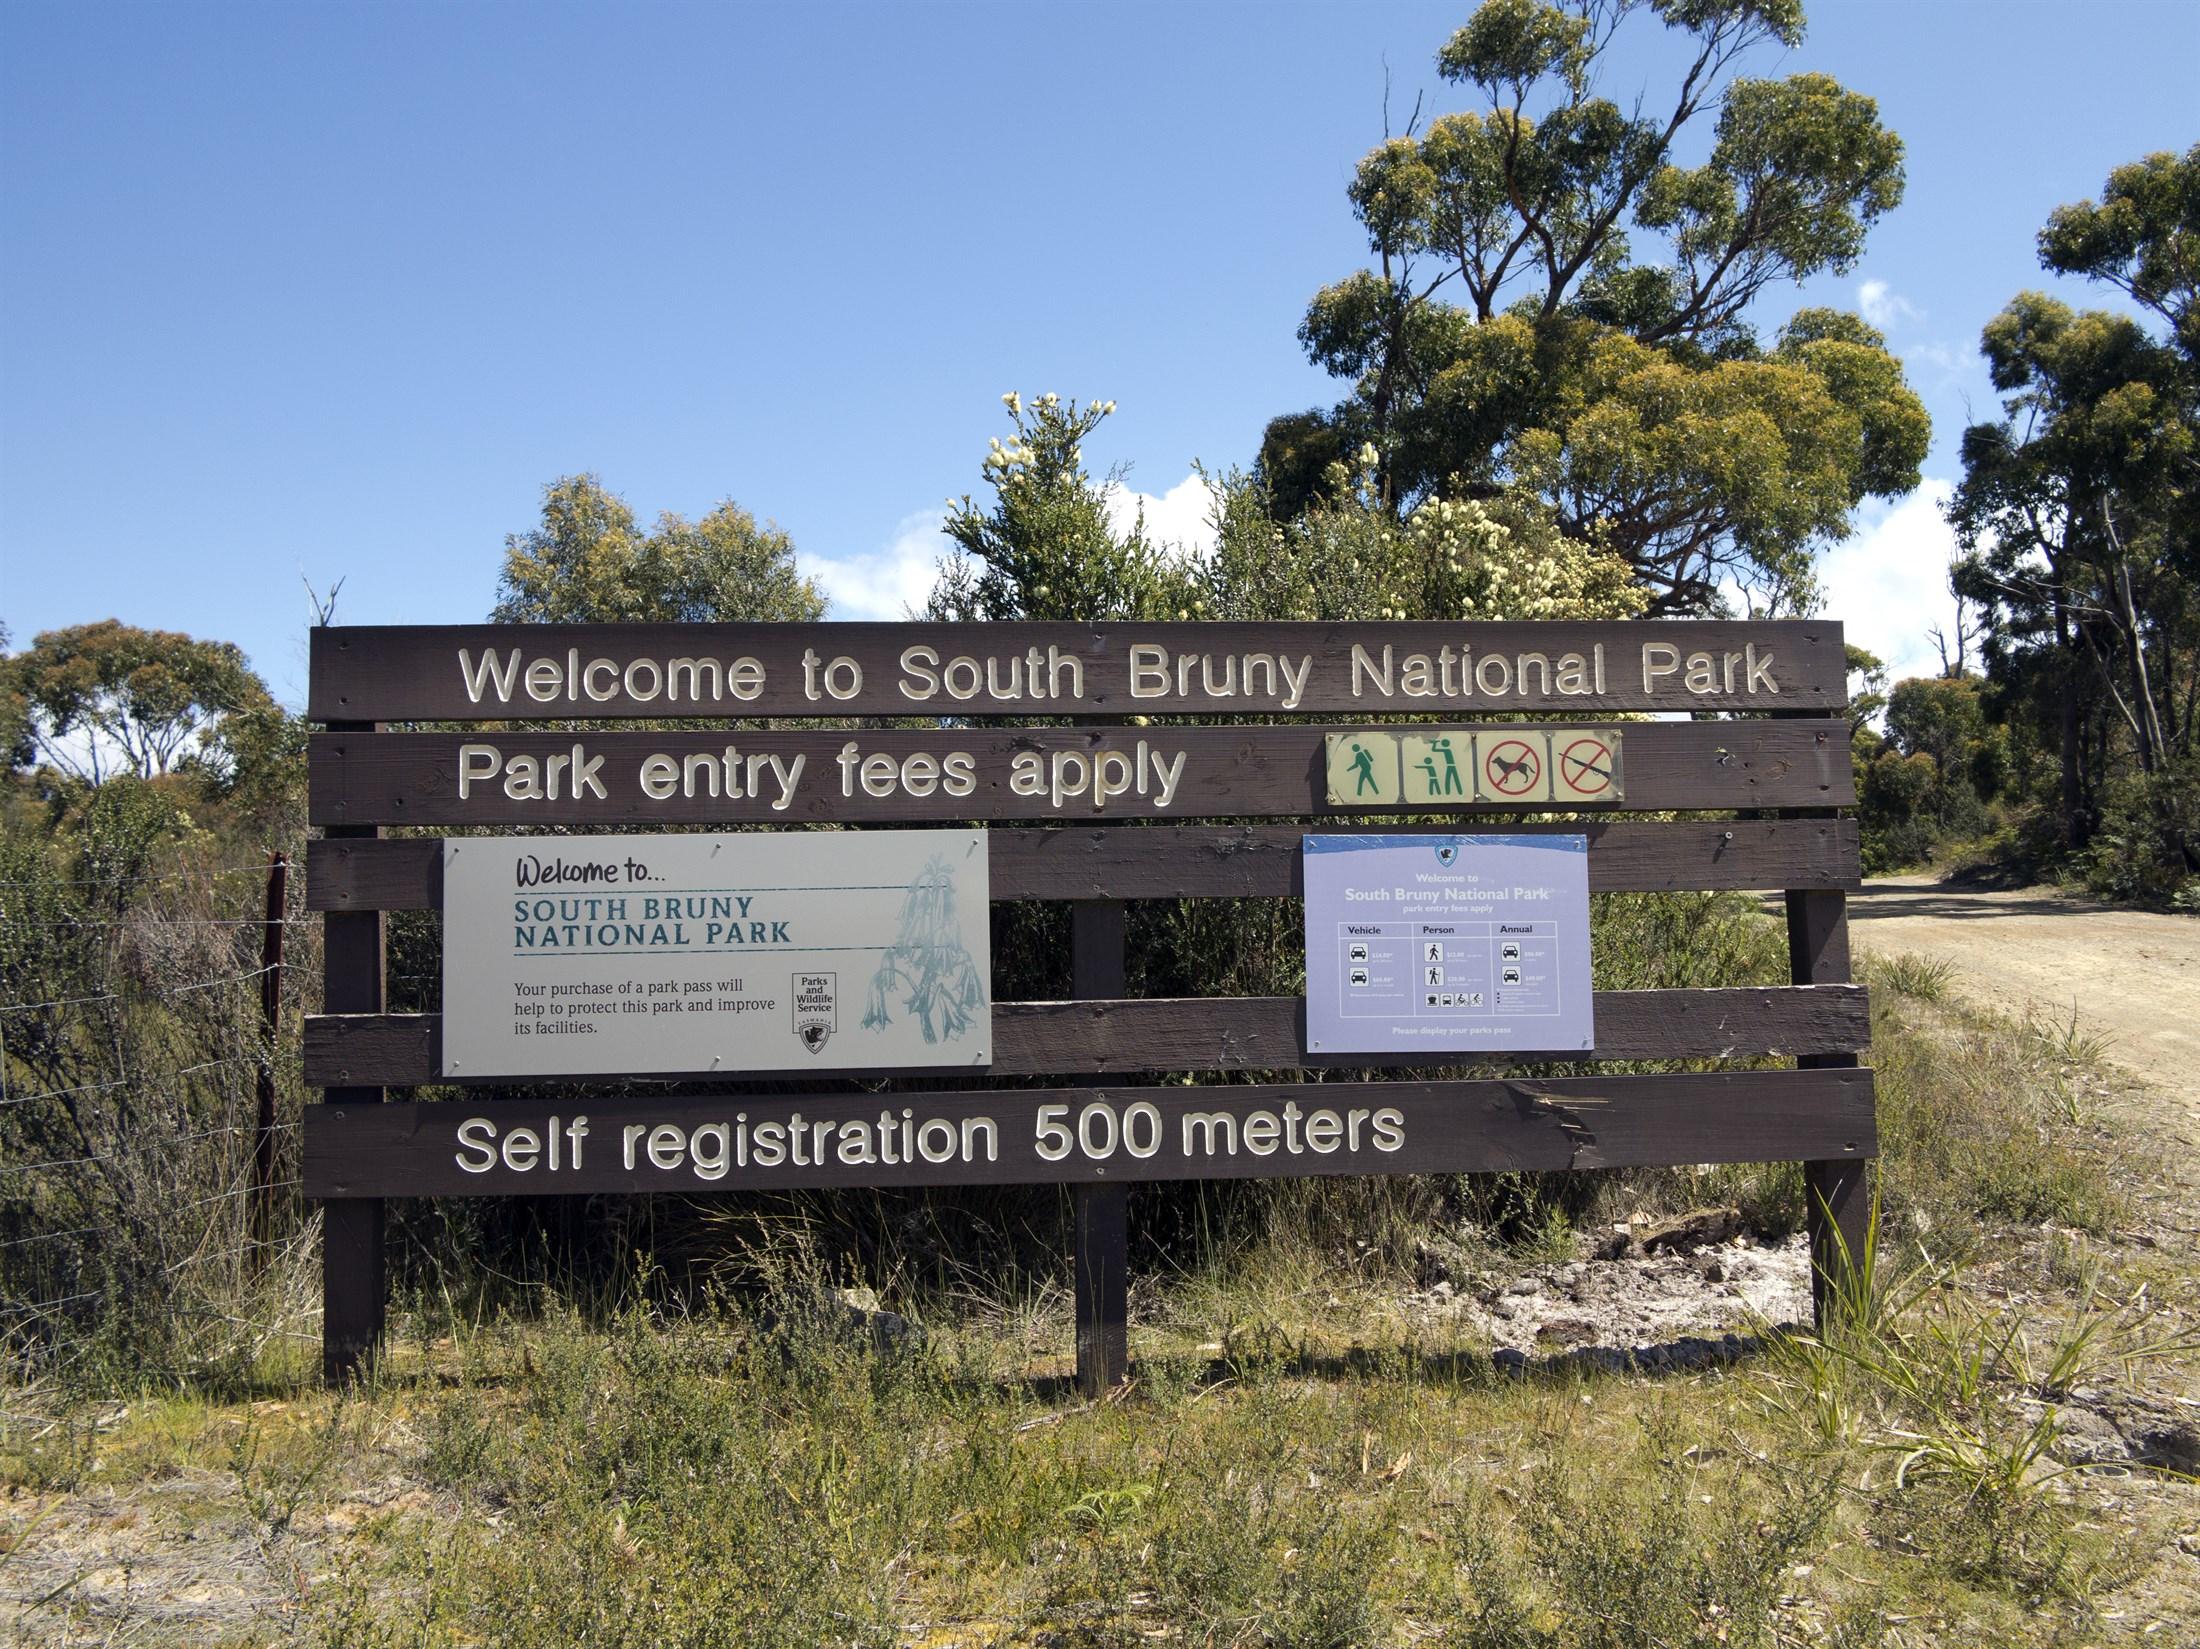 south-bruny-national-park-tasmania_f4cf-2200x1649px